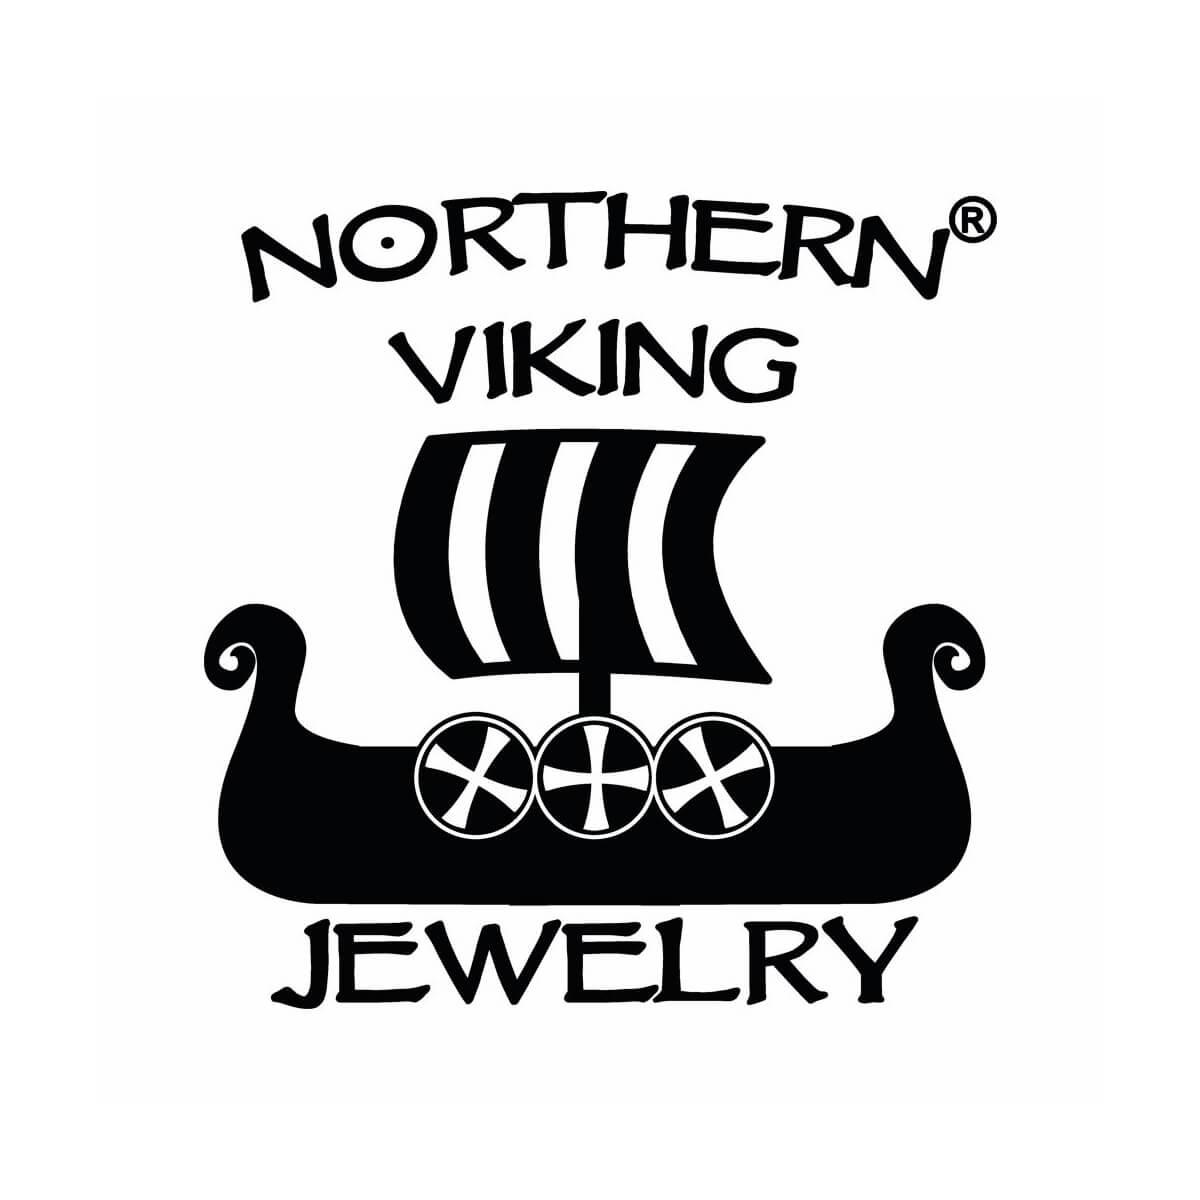 NORTHERN VIKING JEWELRY